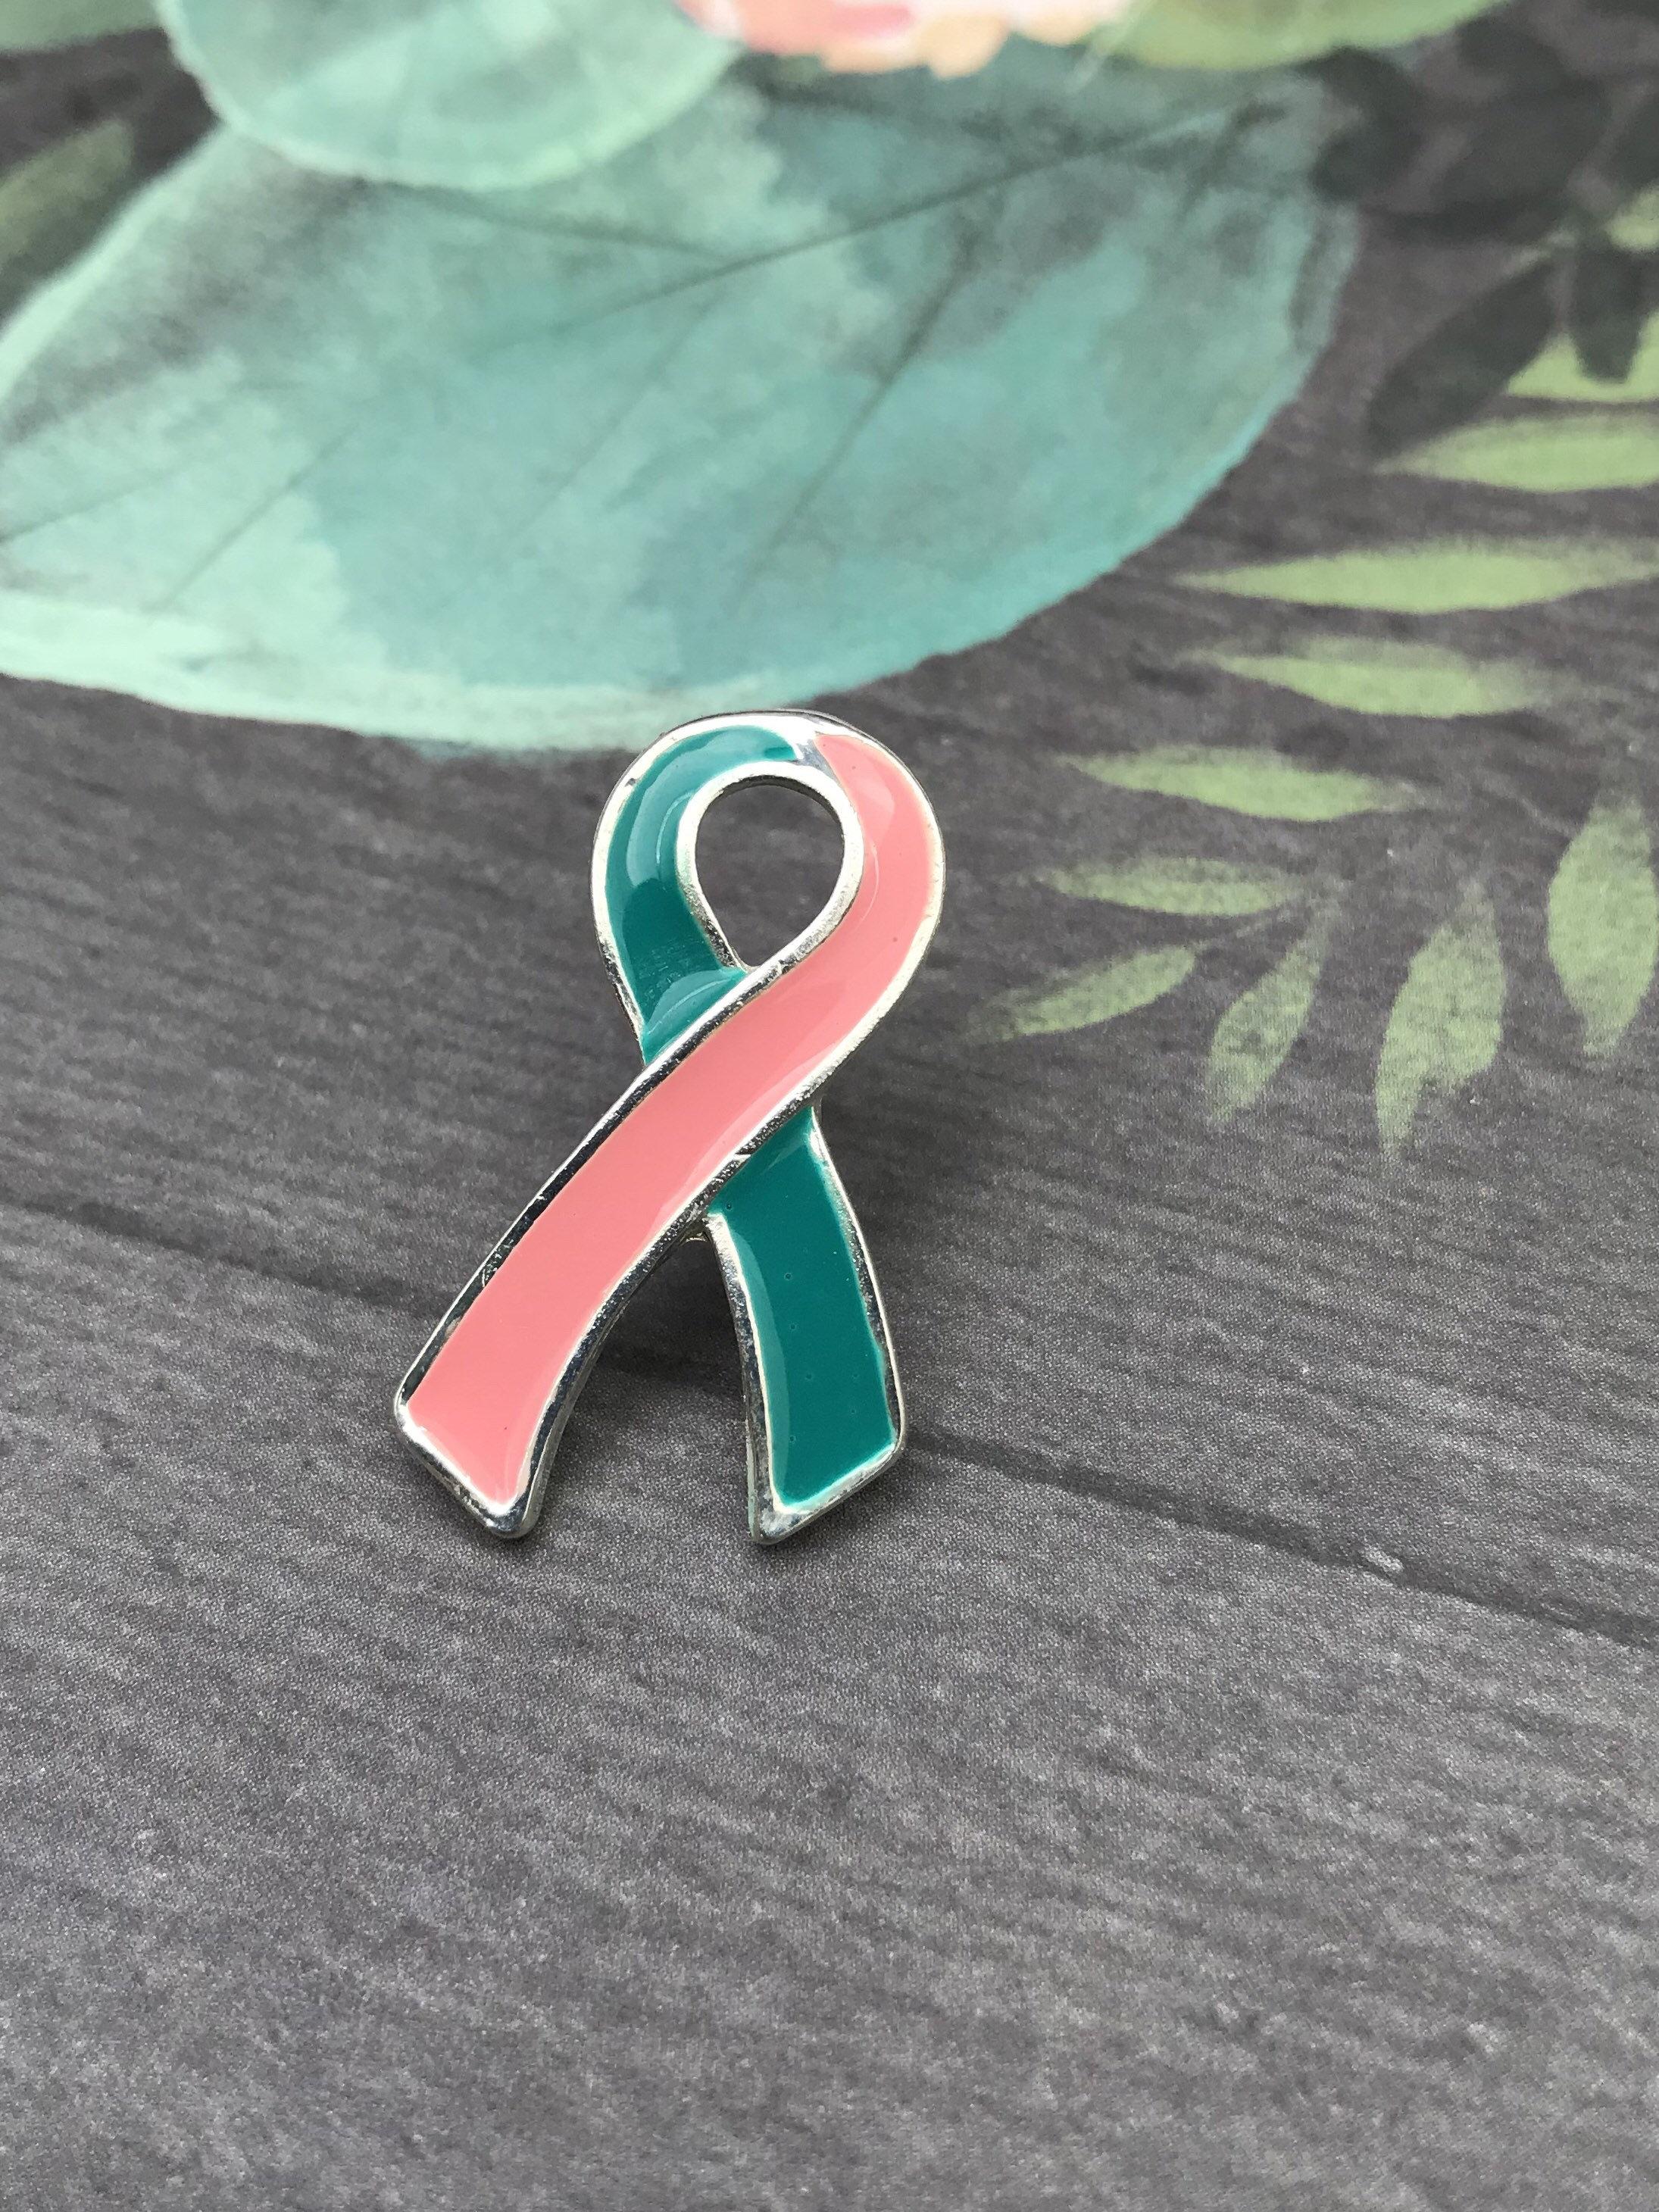 BRCA2  Previvor Cancer Survivor  Awareness BRCA1 Wedding Accessory Pink and Teal Ribbon  Lapel Hat Pin  BRCA